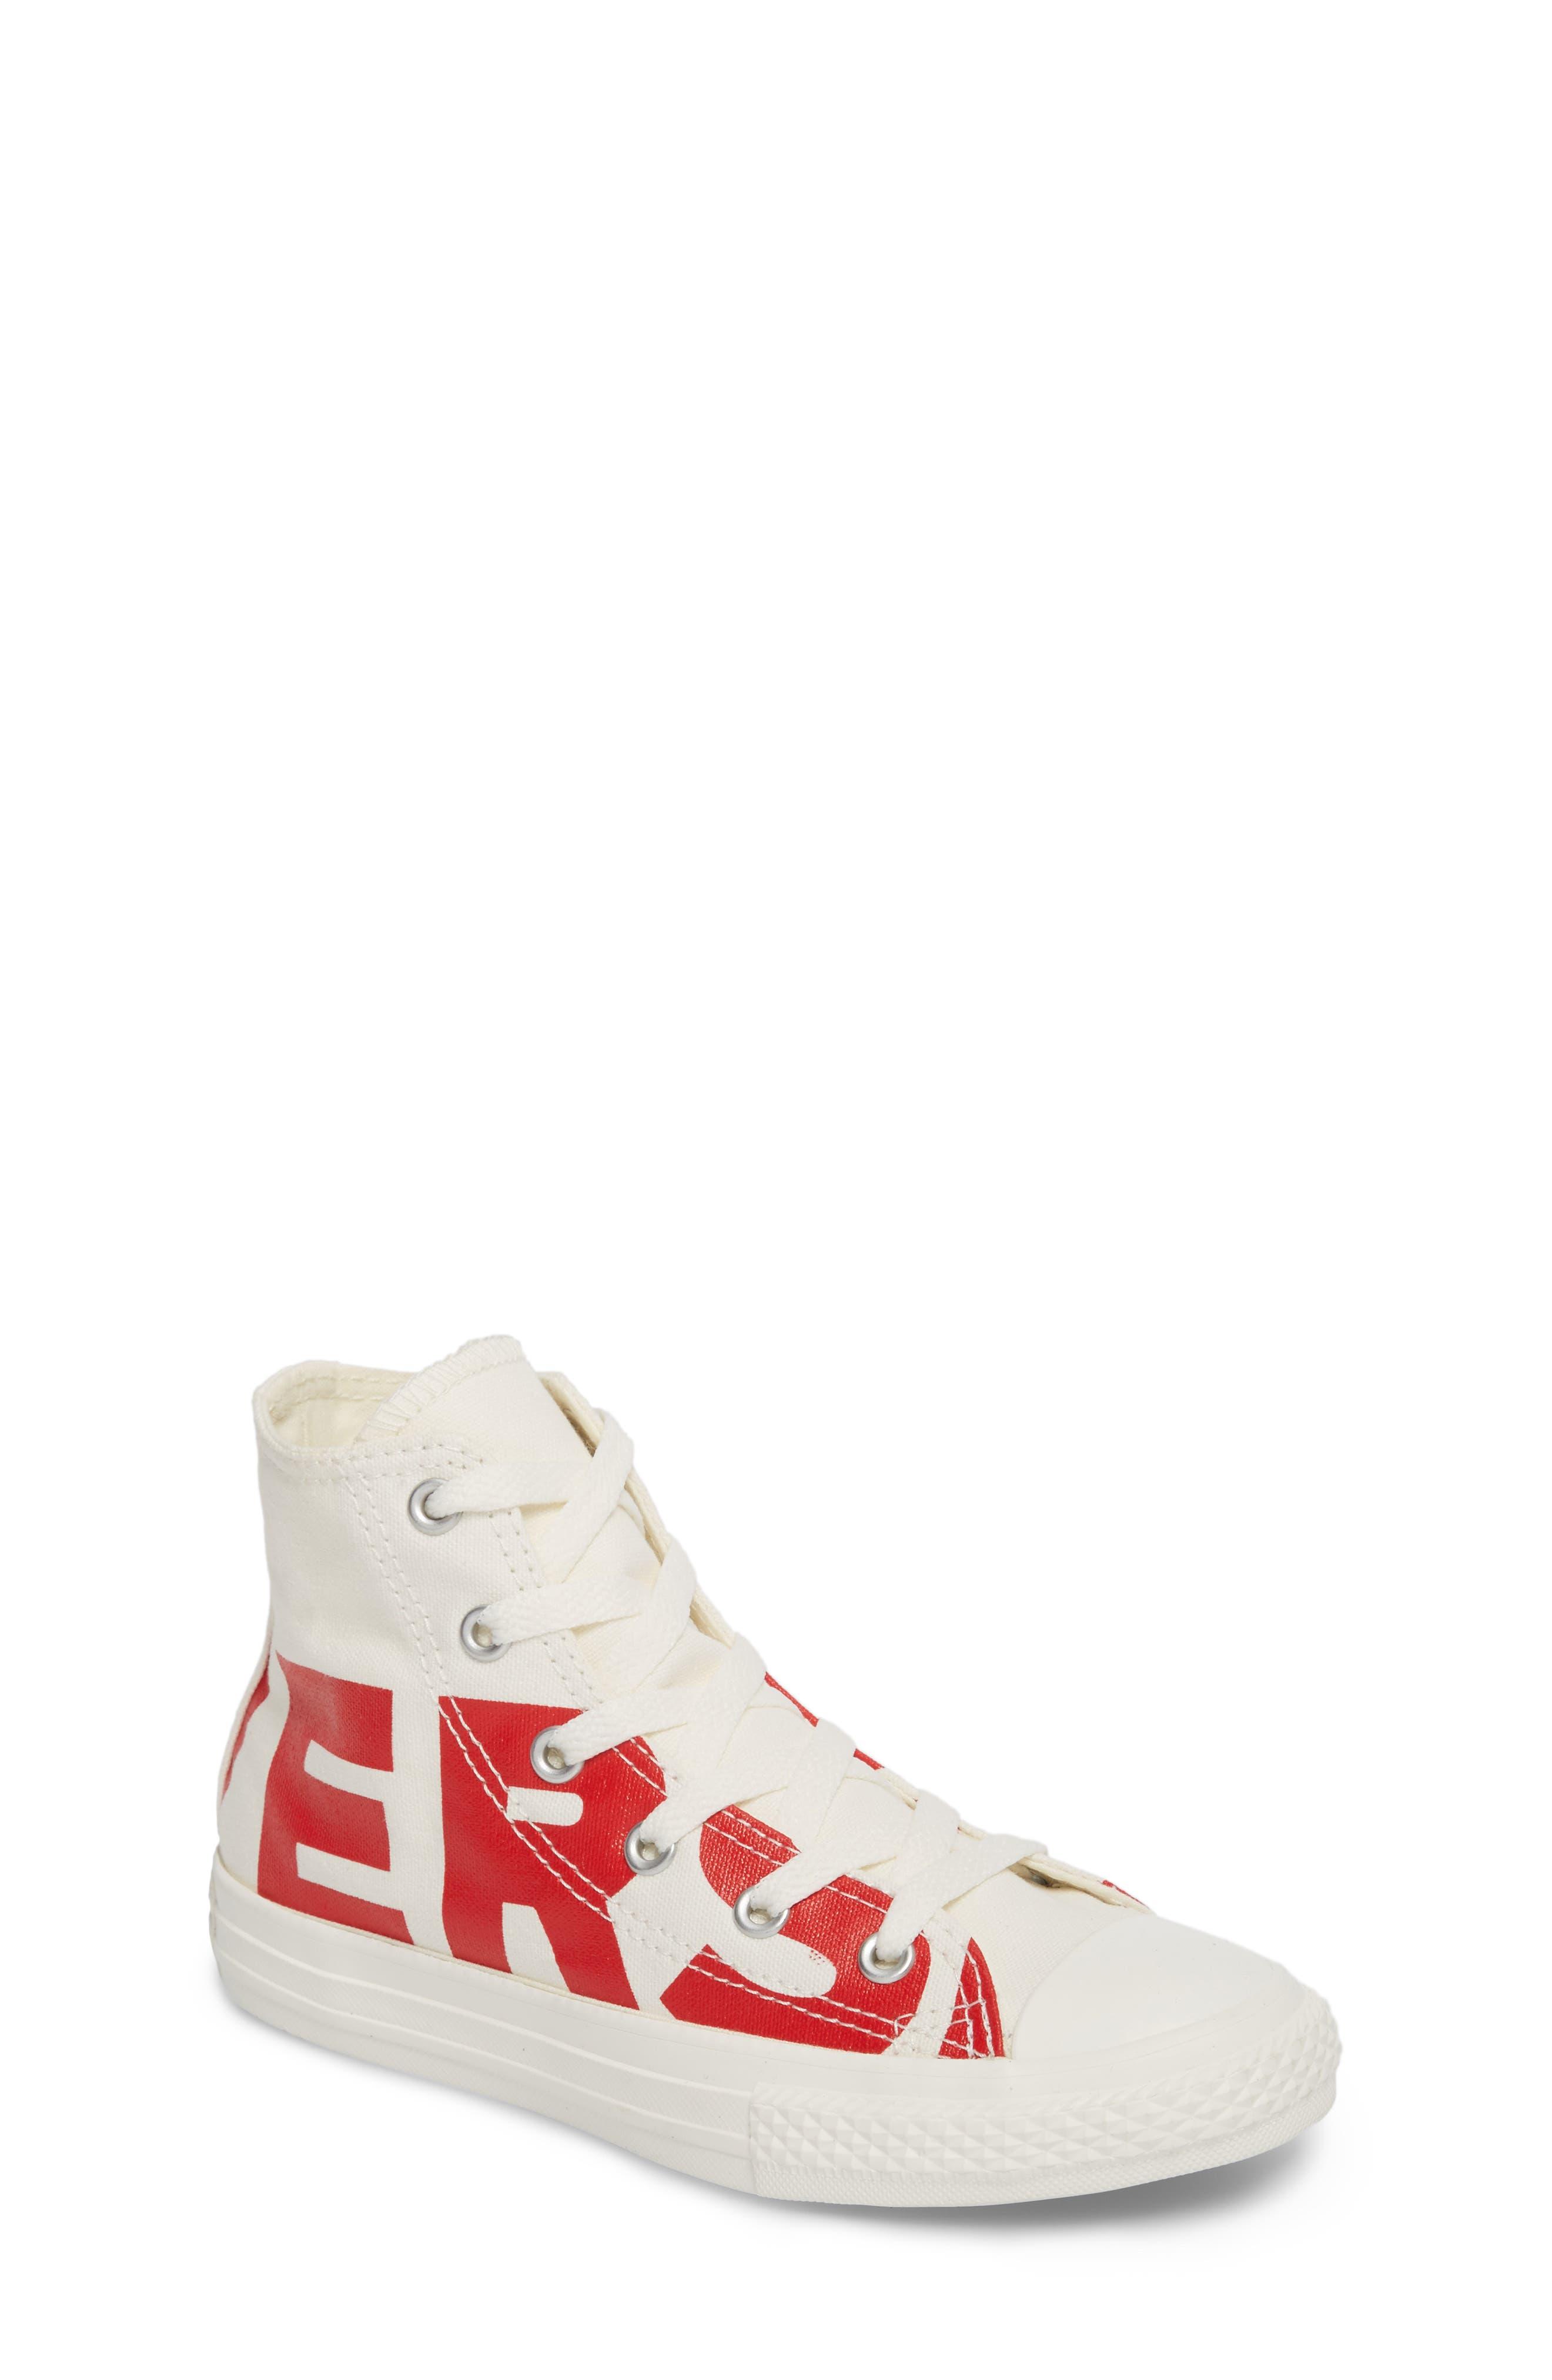 Chuck Taylor<sup>®</sup> All Star<sup>®</sup> Wordmark Hi Sneaker,                         Main,                         color, 600